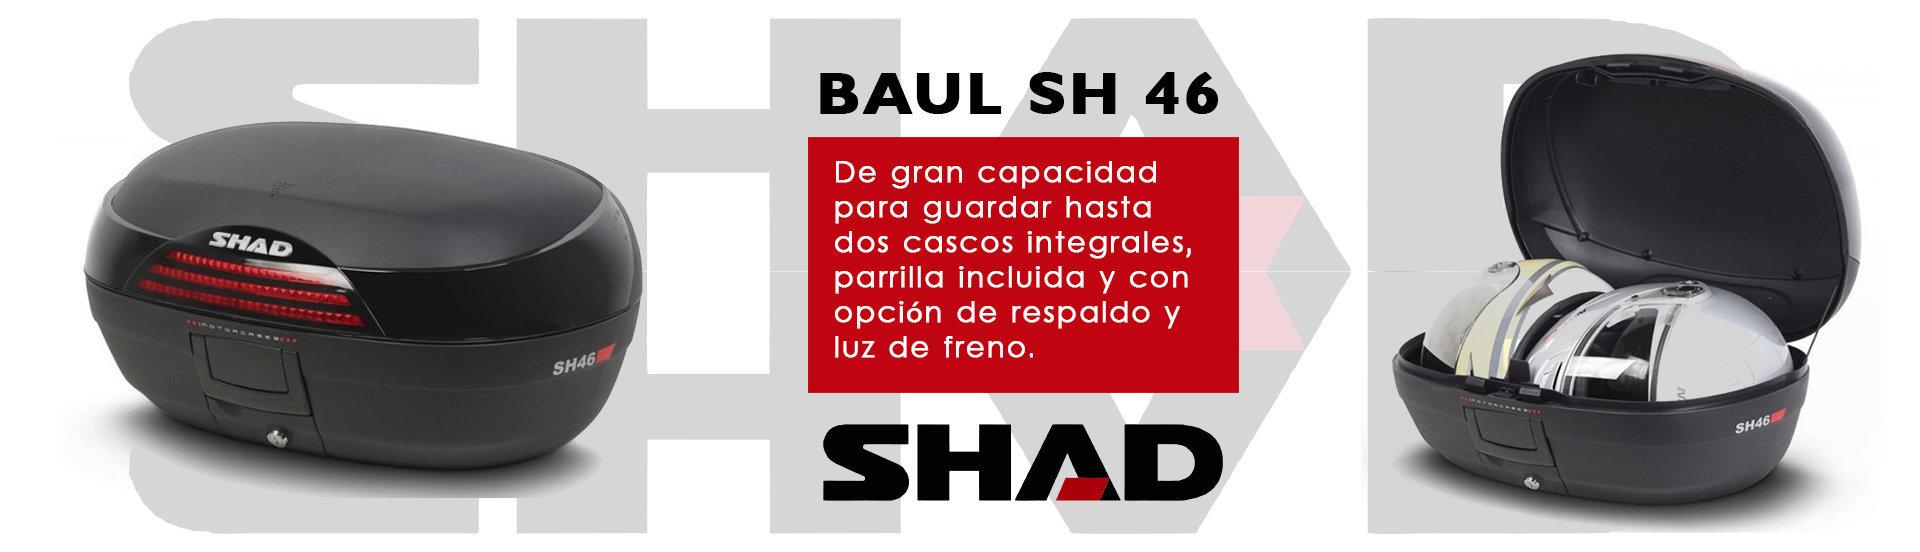 BAUL SHAD SH46